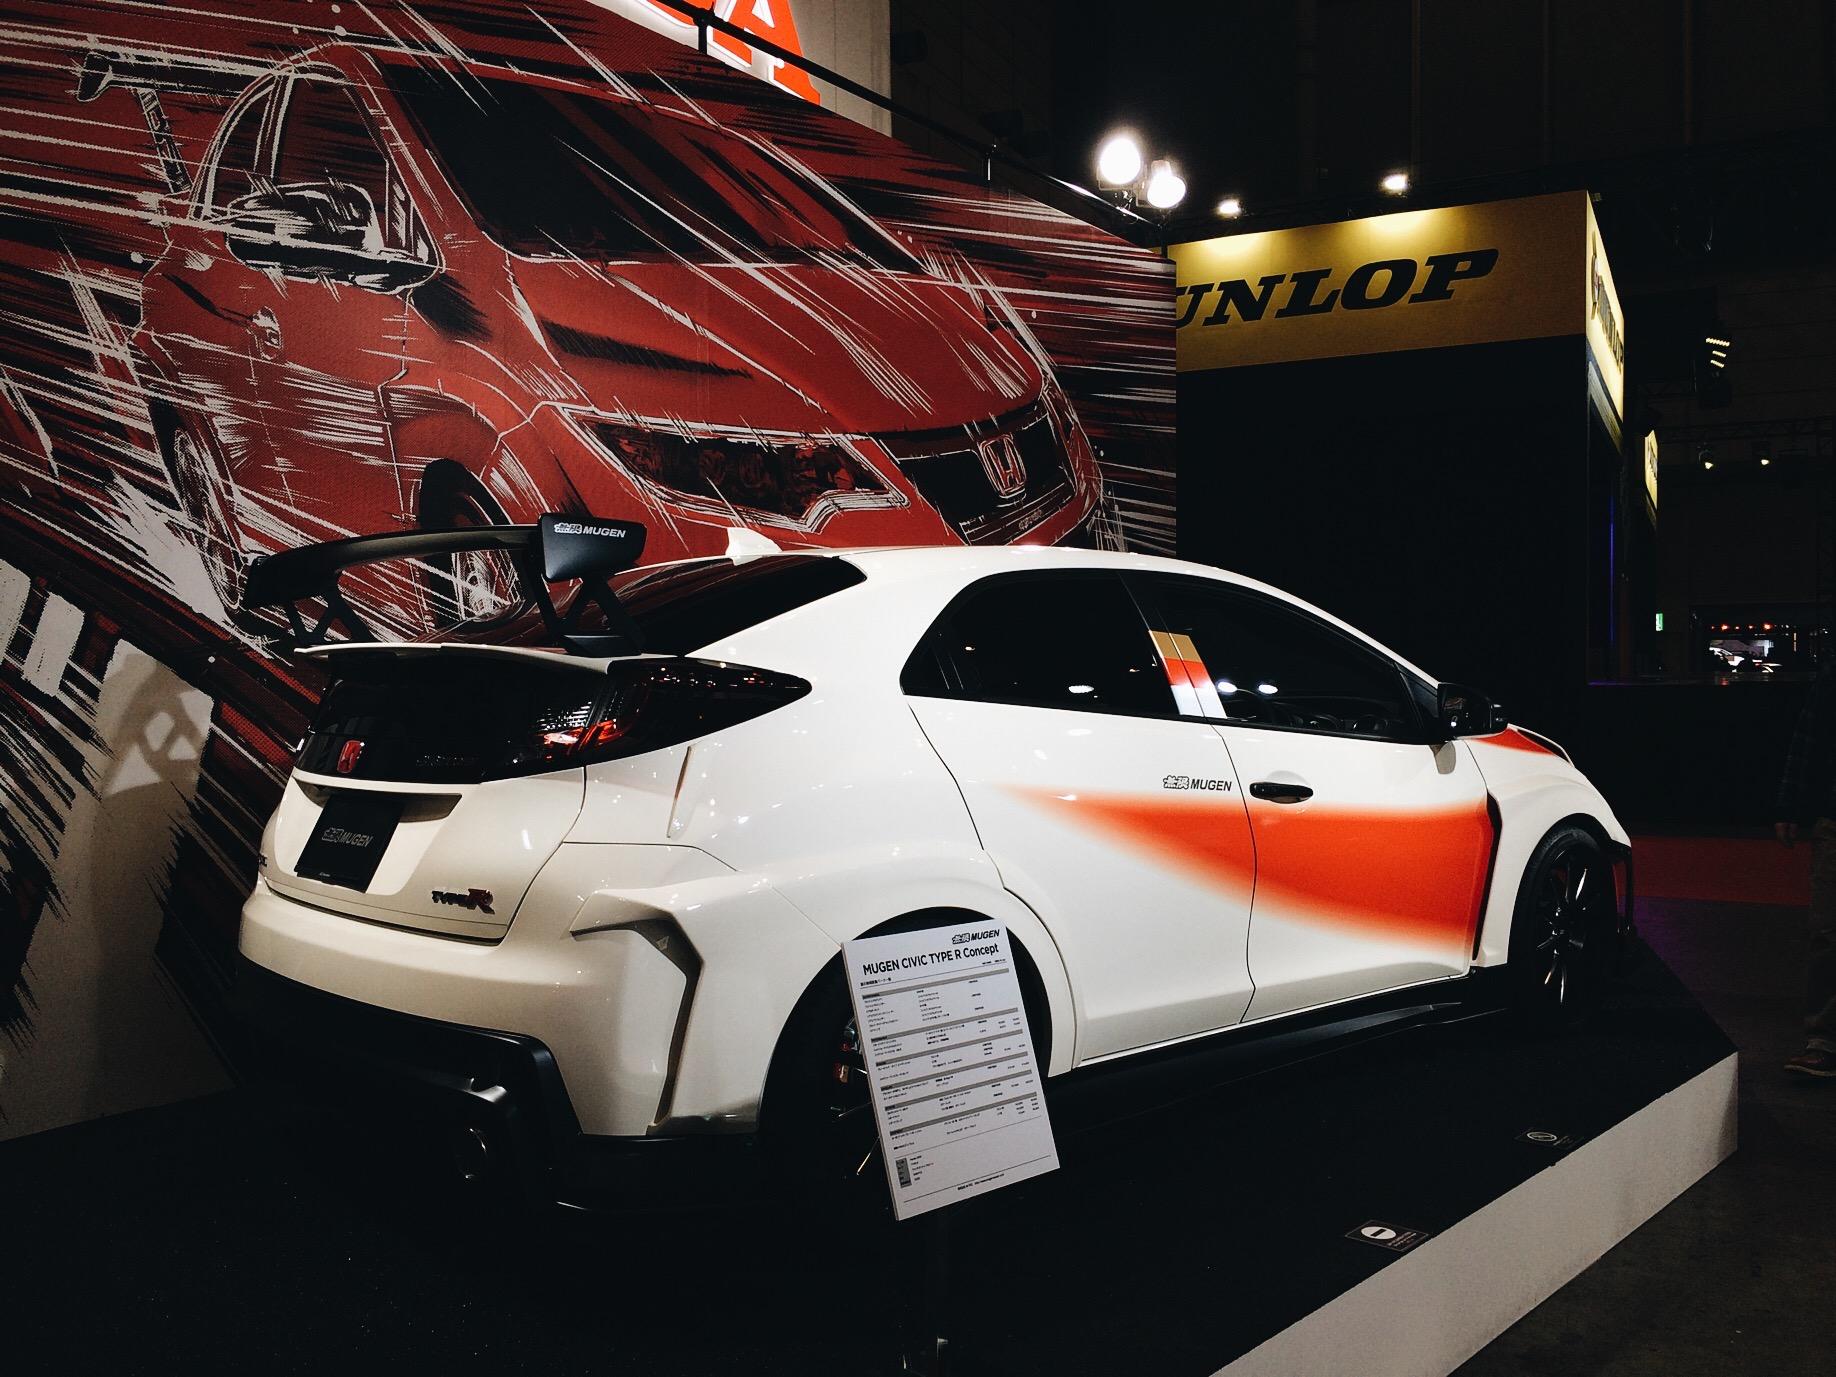 The new Mugen Civic Type-R, so rad!